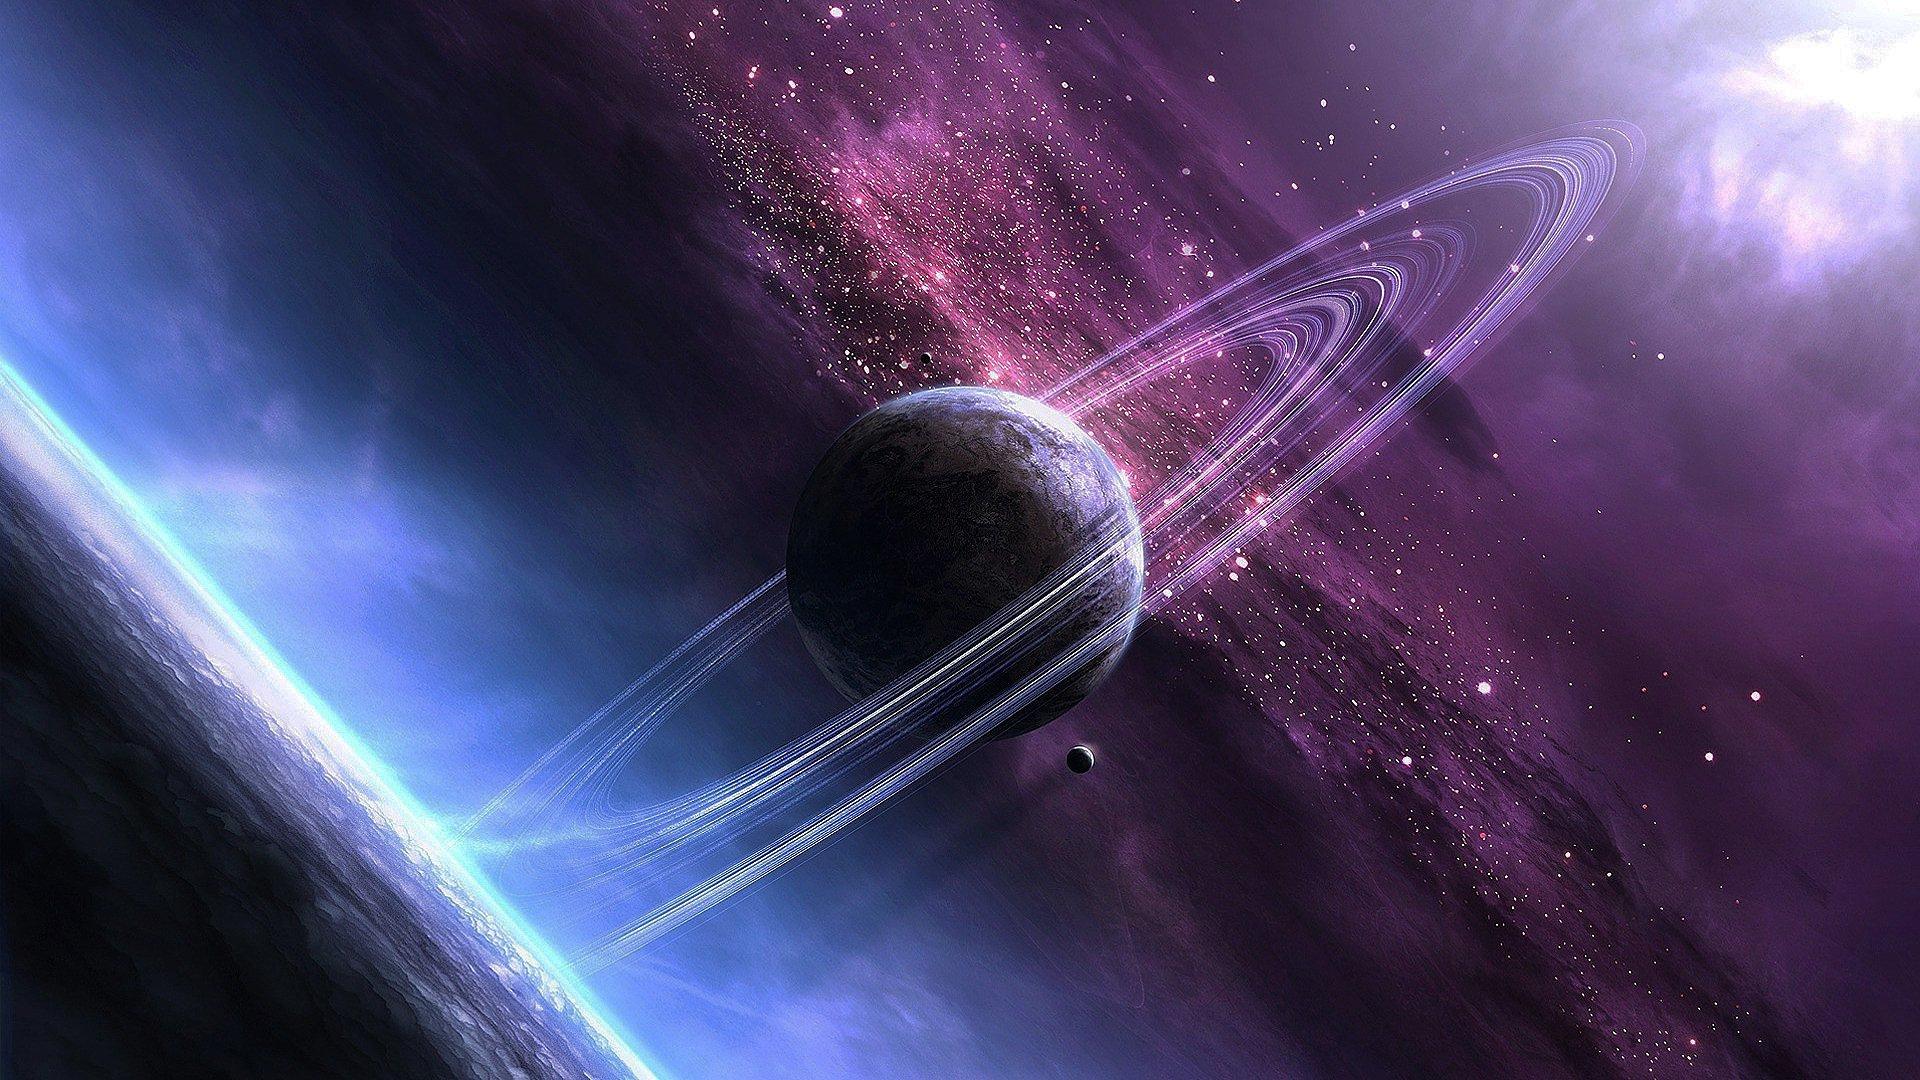 космос, планеты, звезды, галактика, full hd